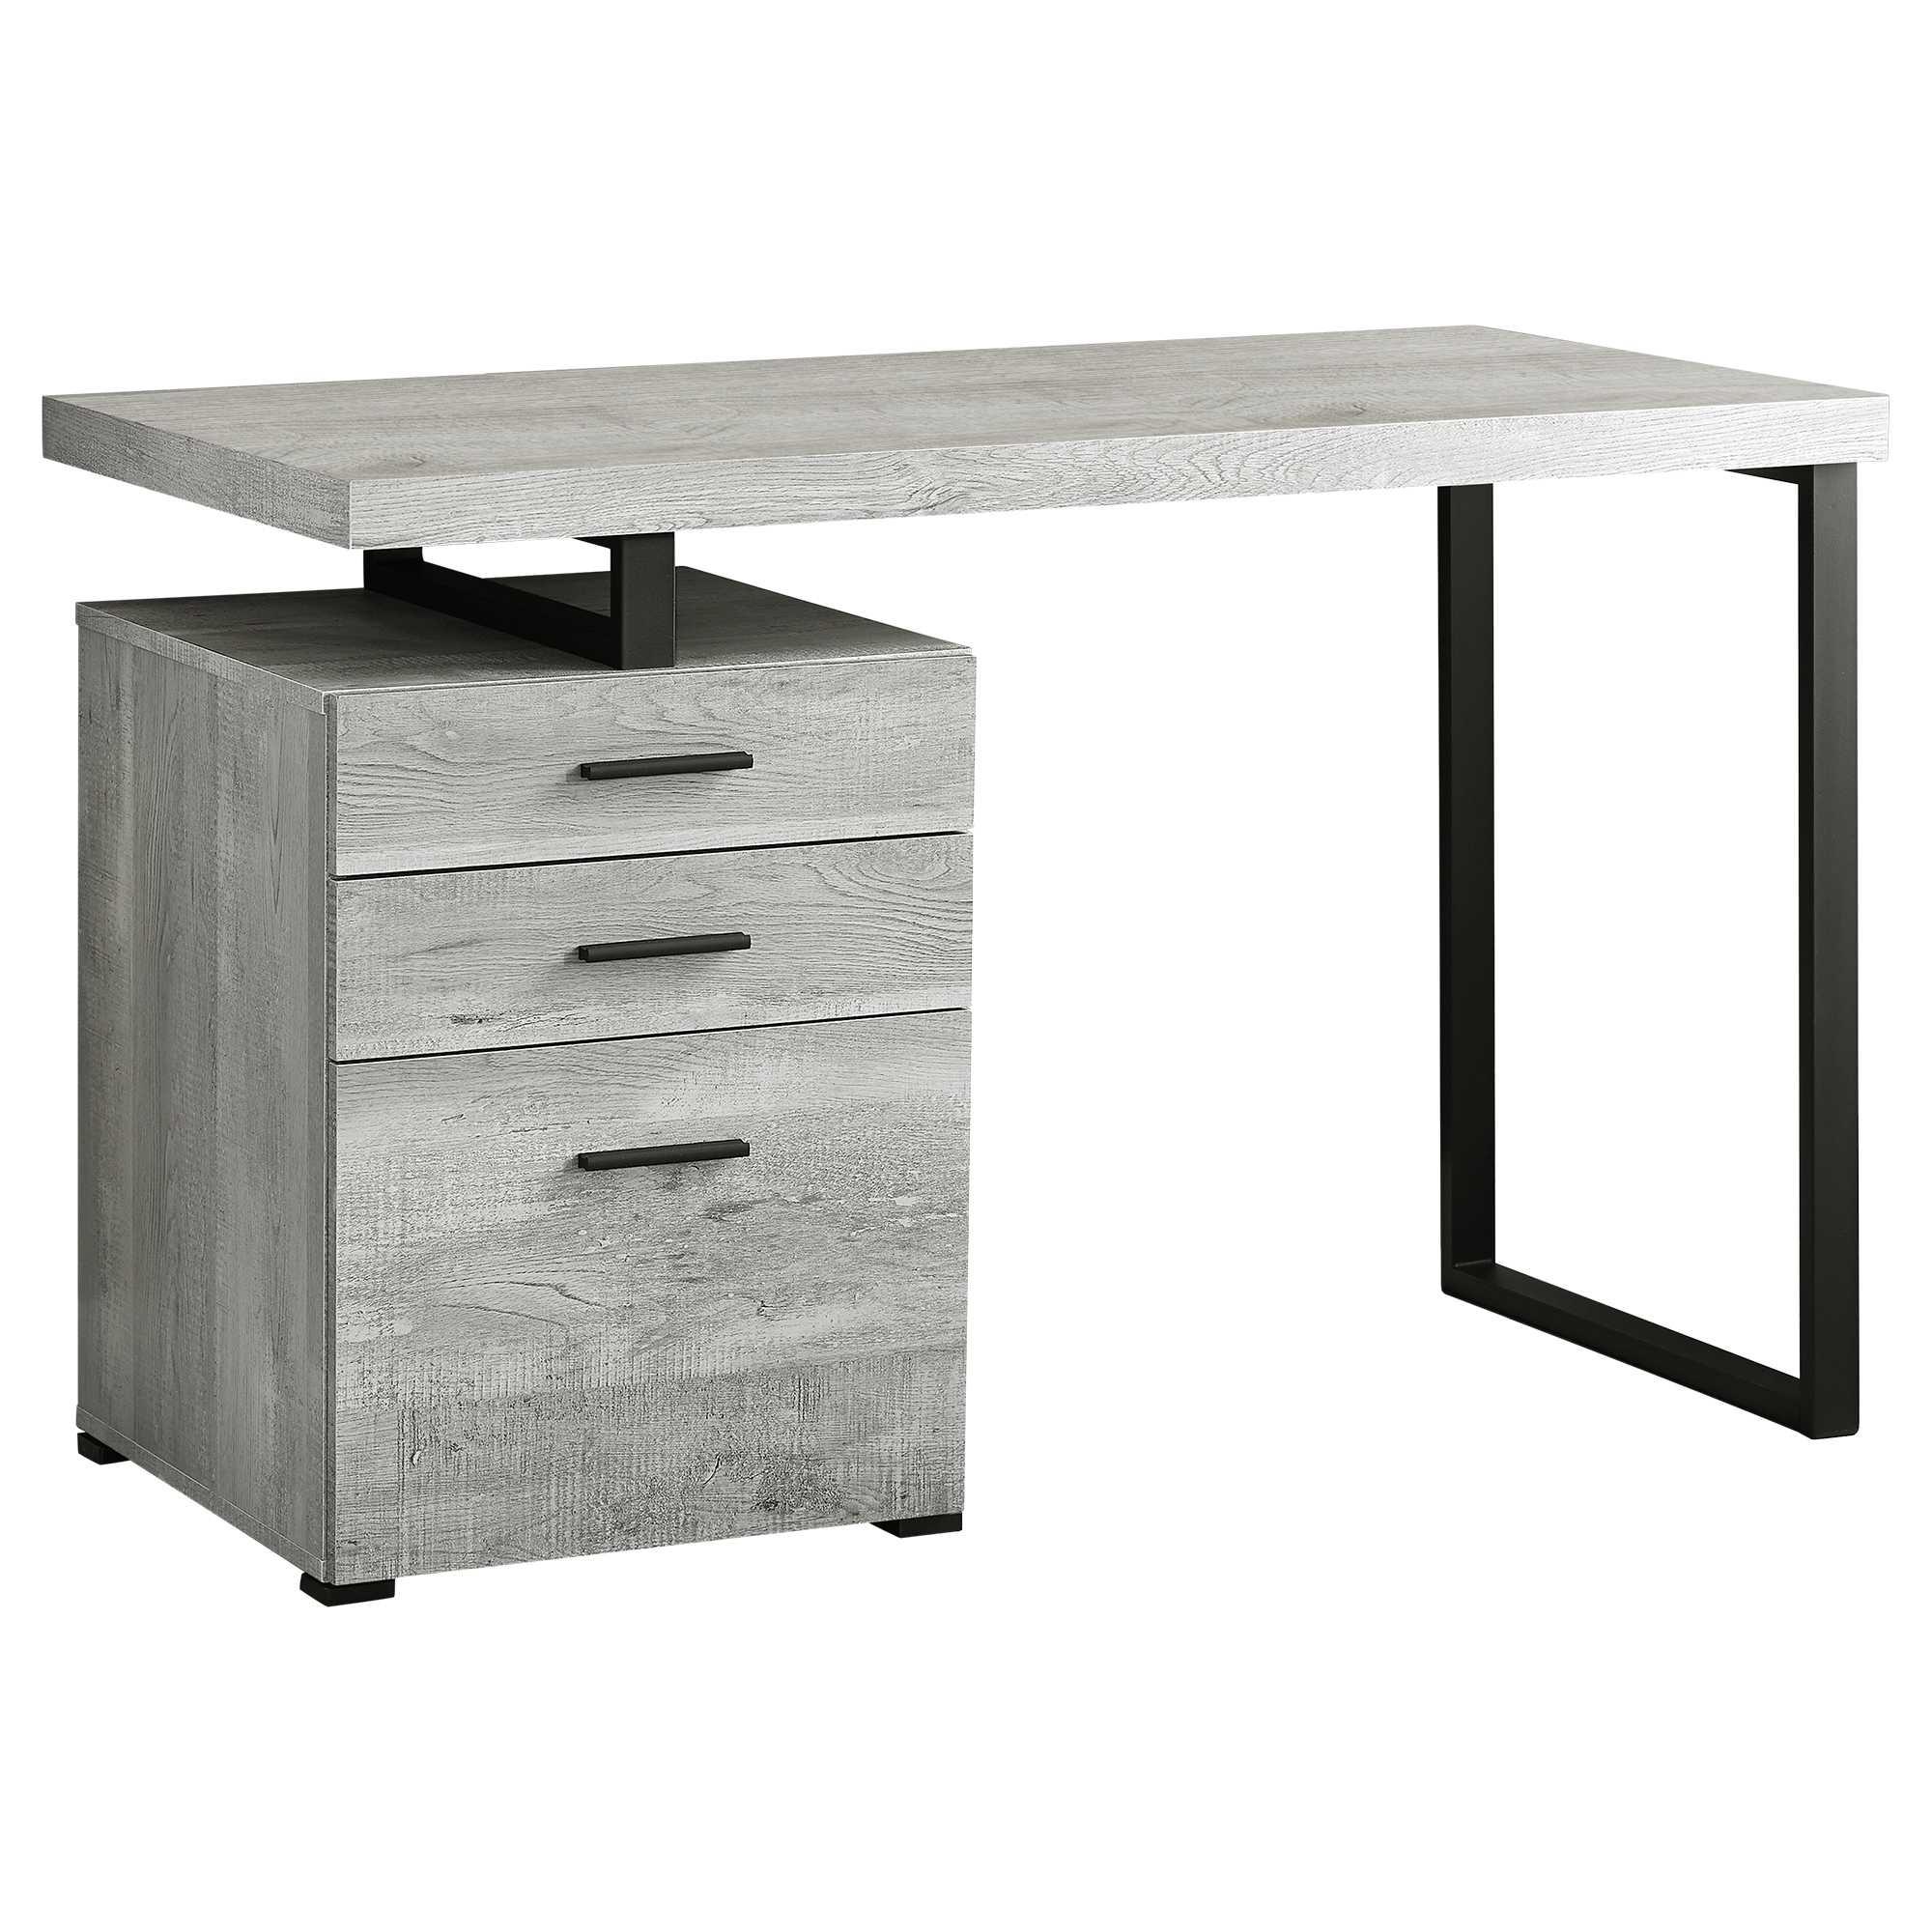 "23.75"" x 47.25"" x 30"" Grey Black Particle Board Hollow Core Metal  Computer Desk"